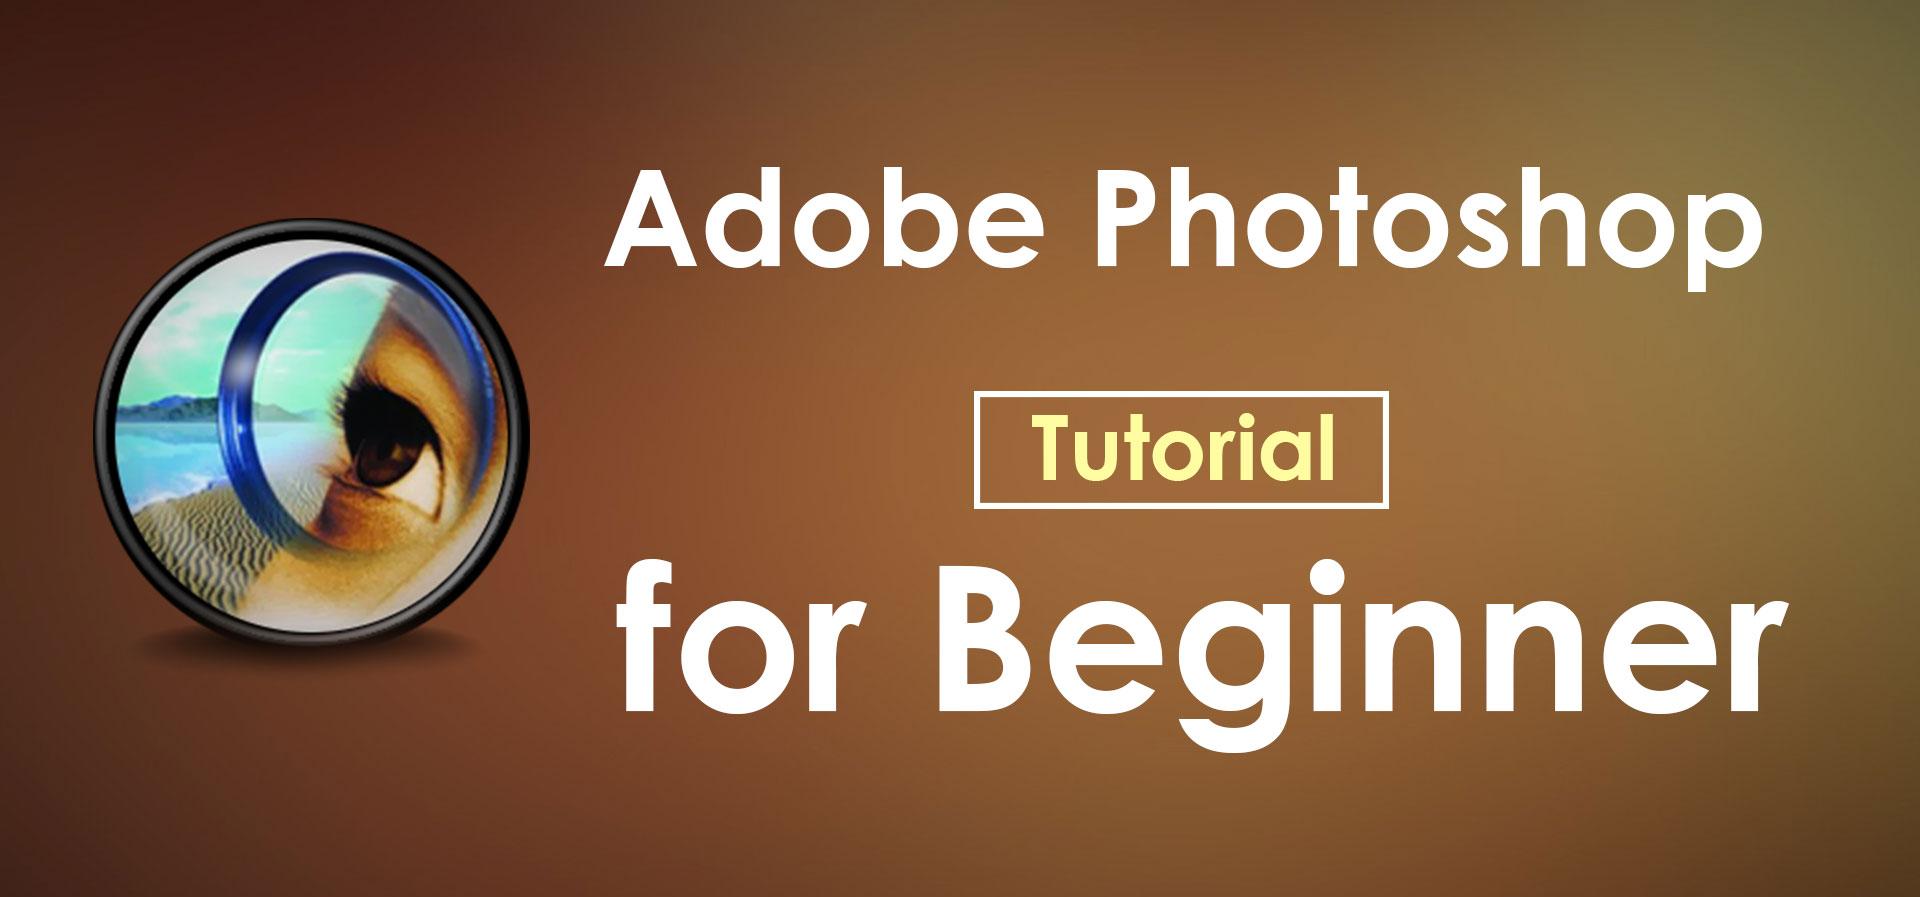 Adobe-Photoshop-Tutorial-for-Beginner